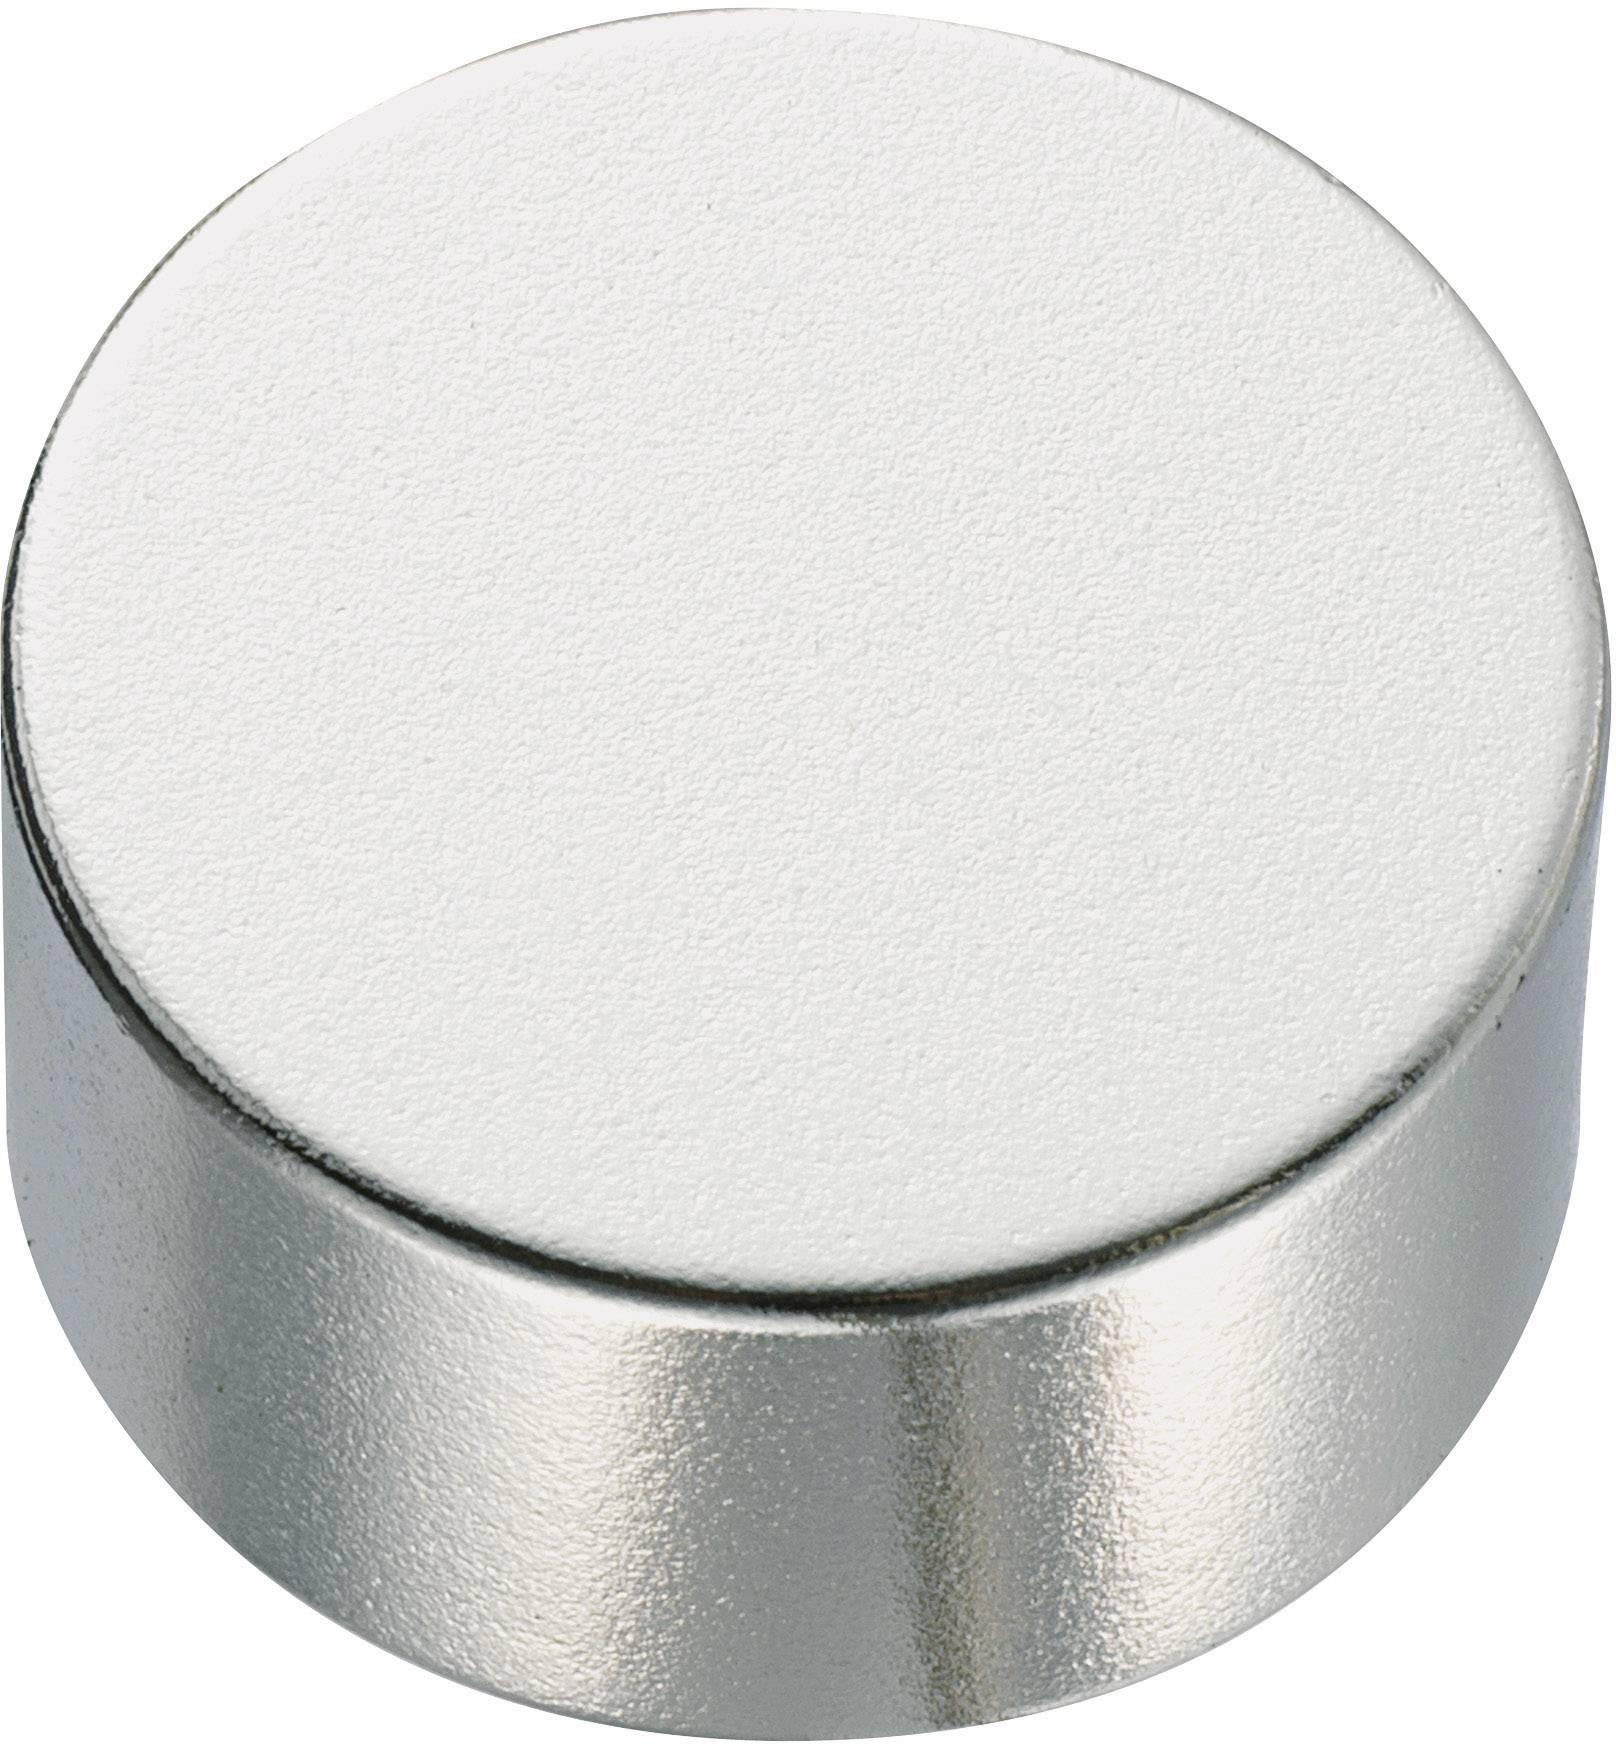 Permanentný magnet, N45, 20 x 2 mm, valcový